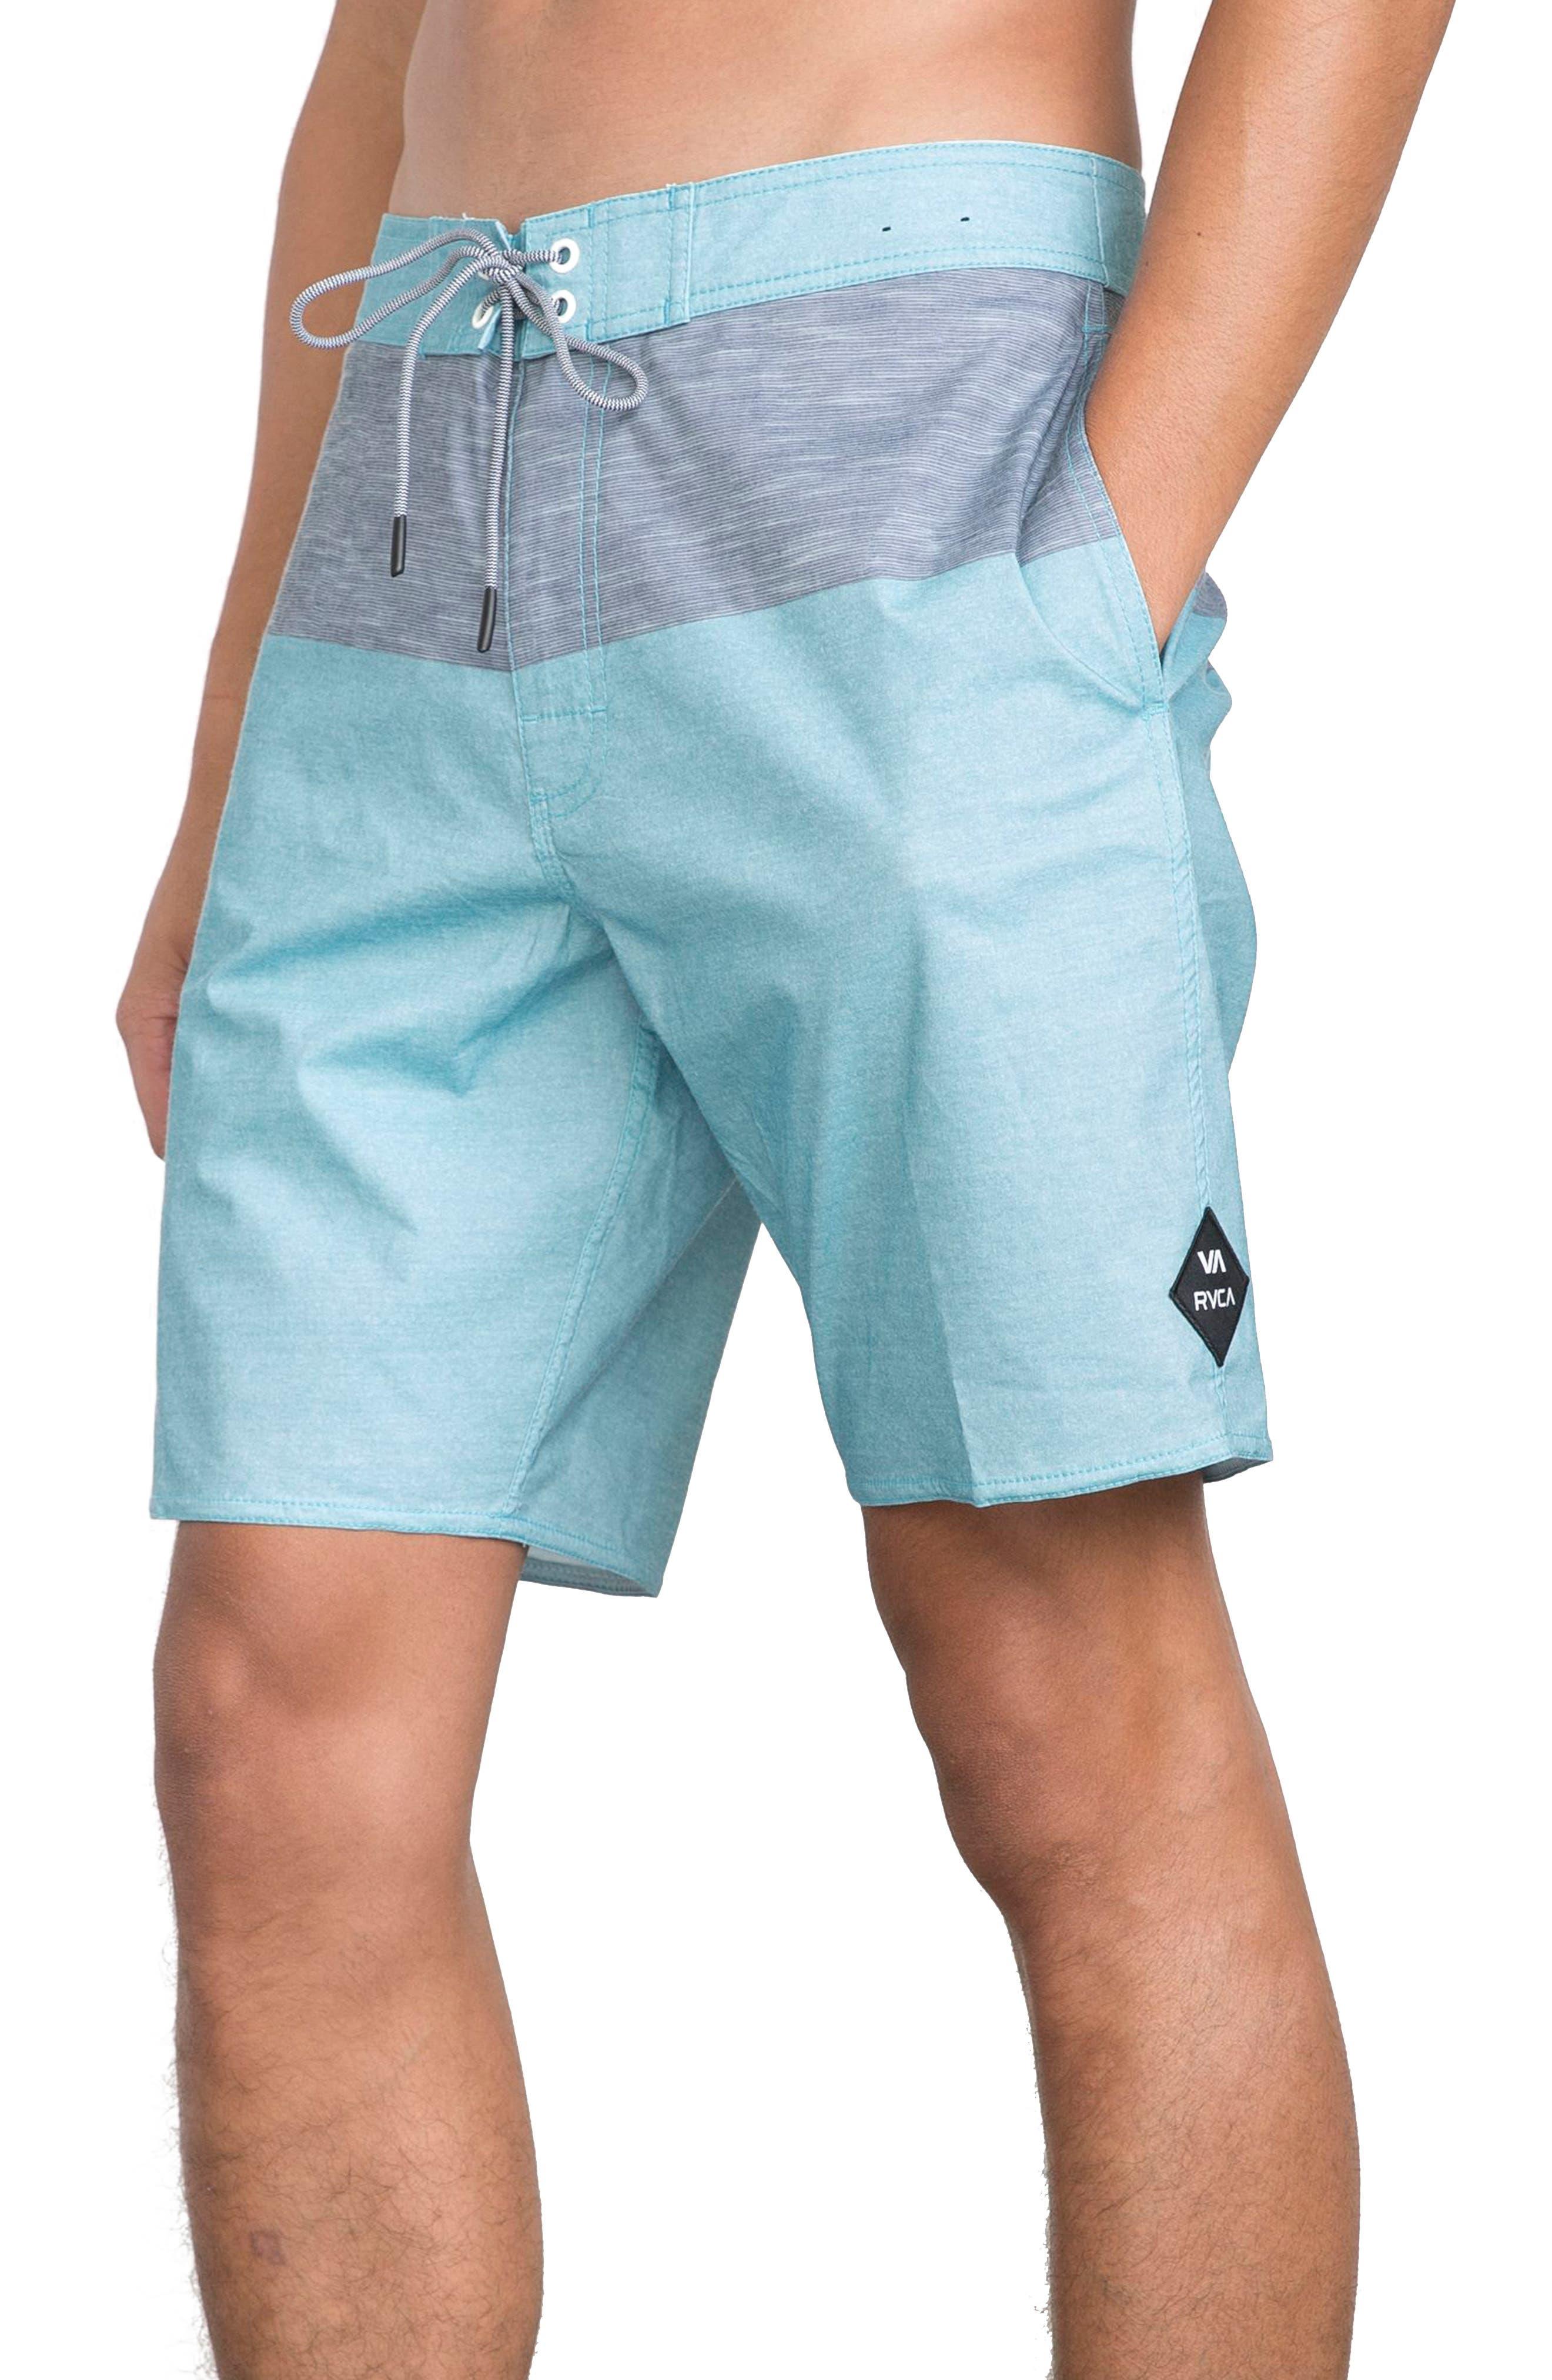 Gothard Board Shorts,                             Alternate thumbnail 3, color,                             MAUI BLUE